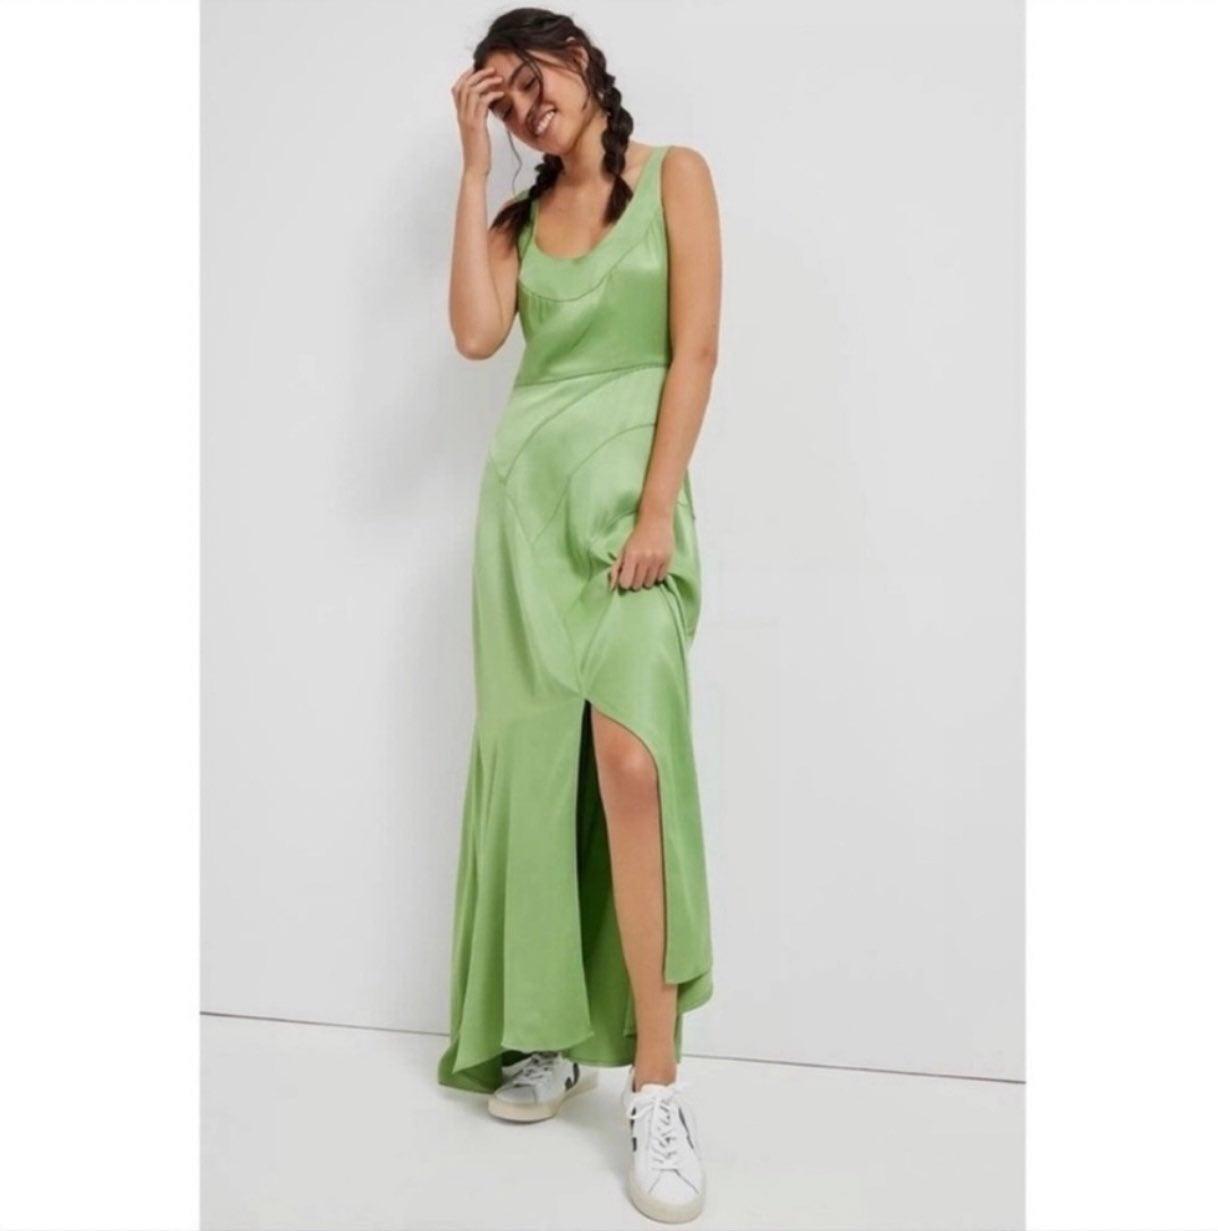 Details about  /NWT ANTHROPOLOGIE VANESSA HALTER MAXI DRESS by RAGA M